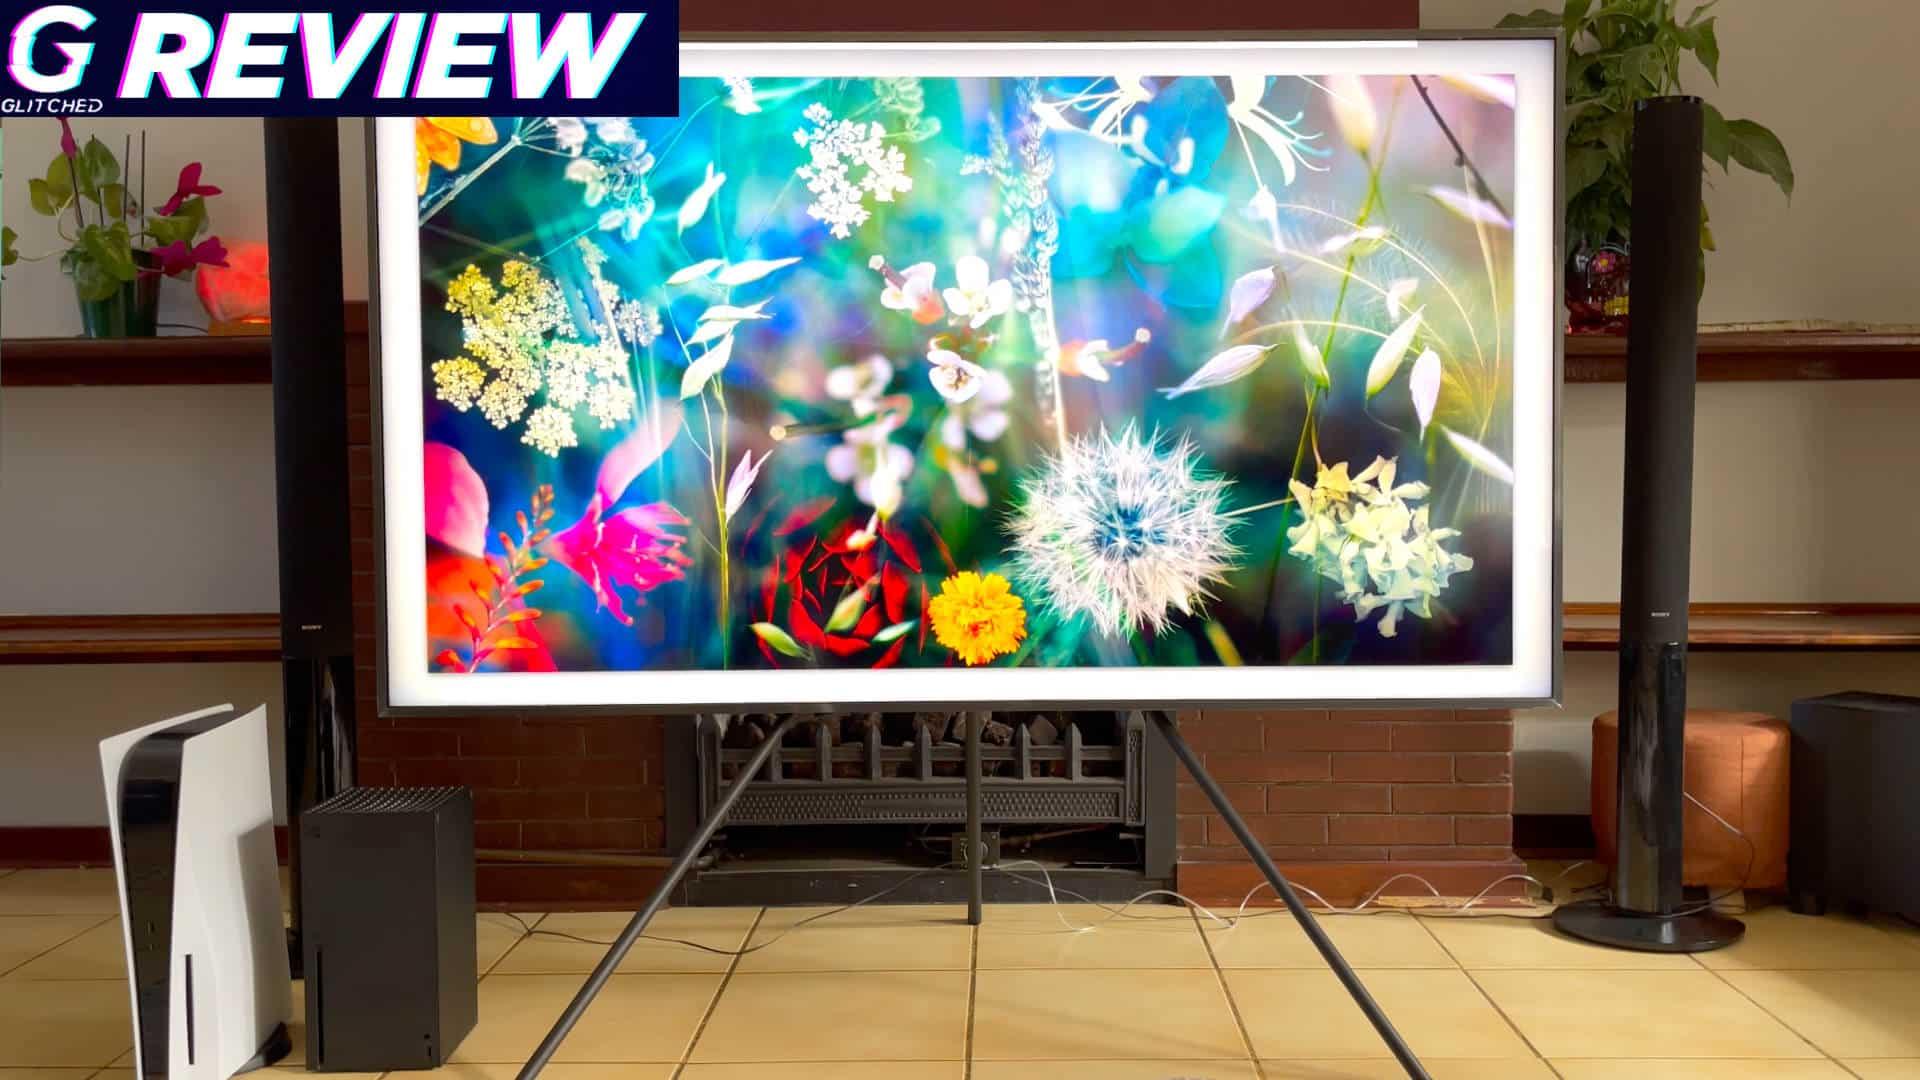 Samsung The Frame 2020 TV Review